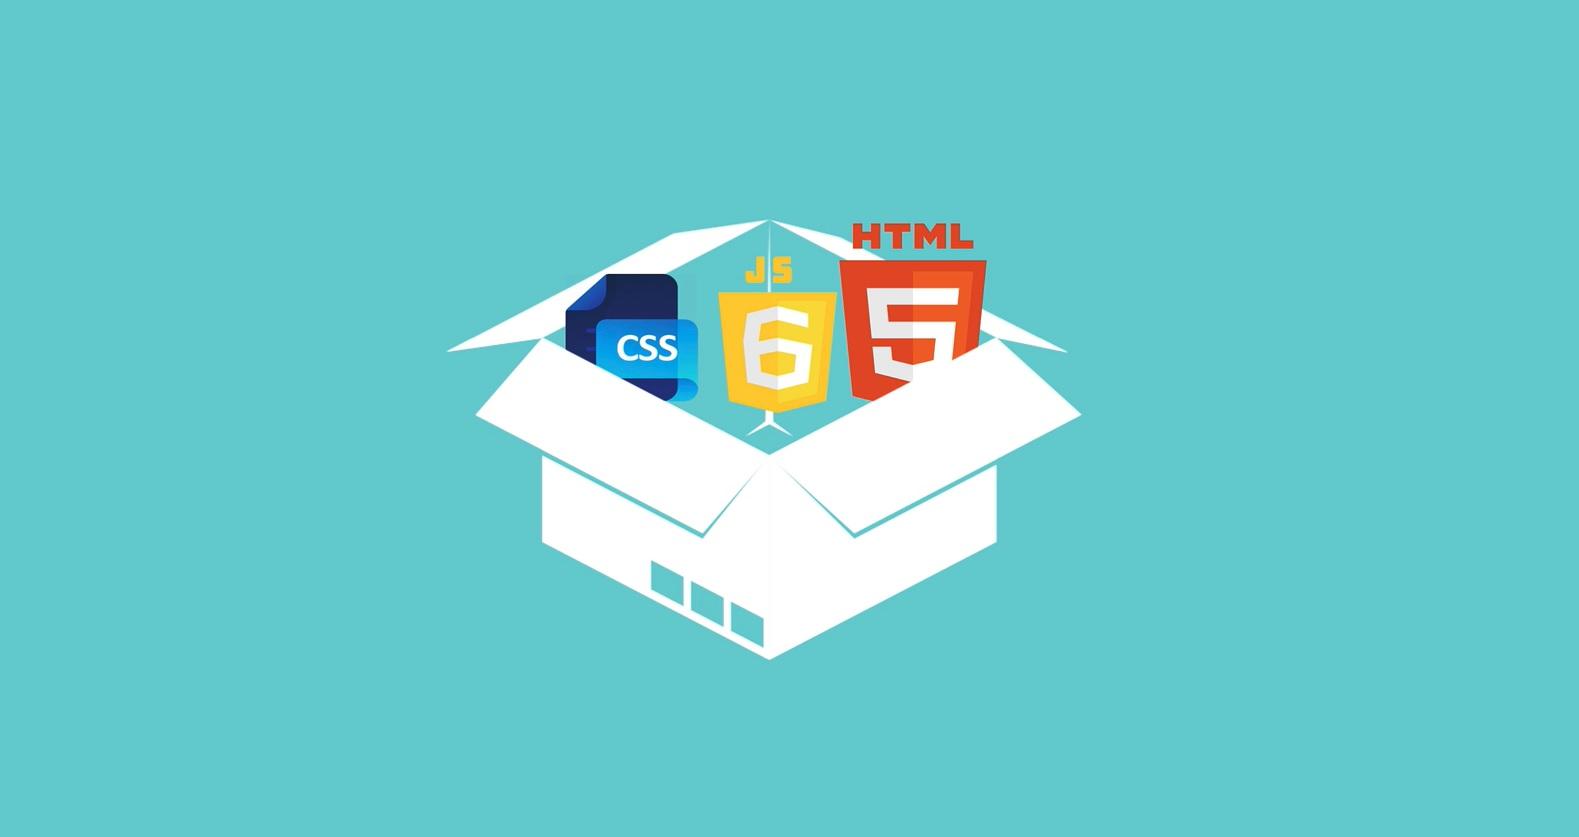 perbedaan html css javascript